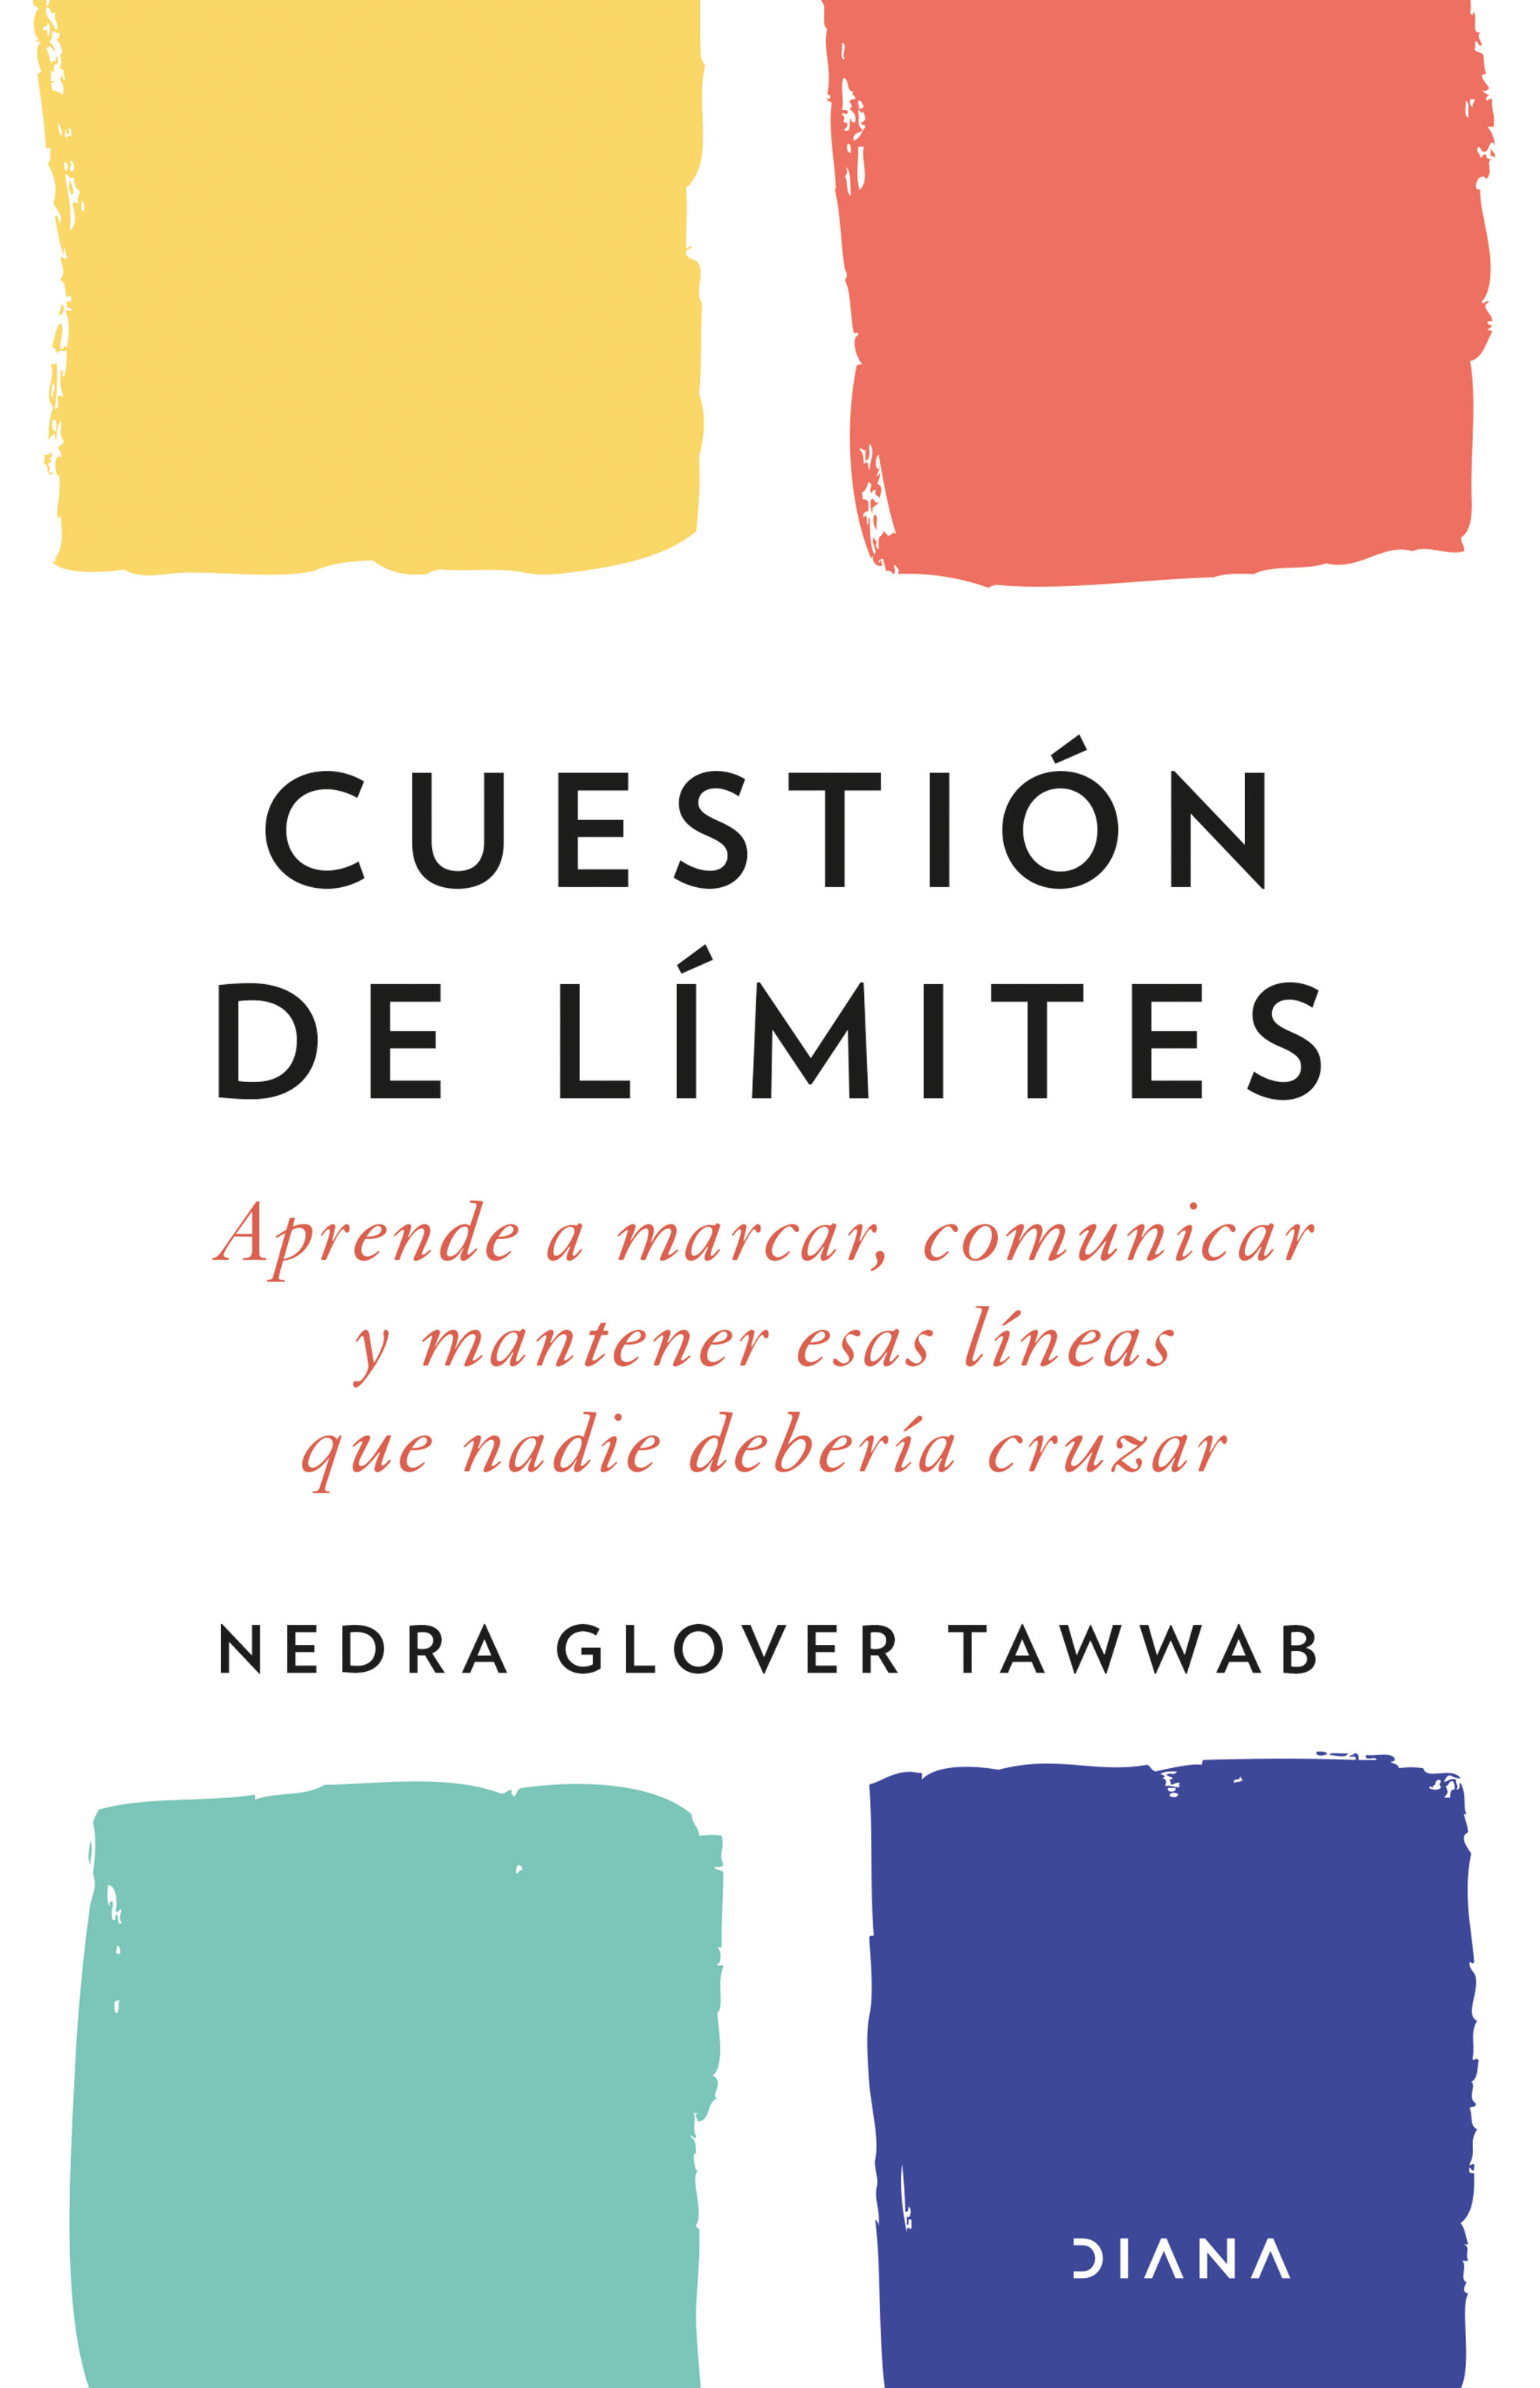 Libro de Nedra Glover Tawwab